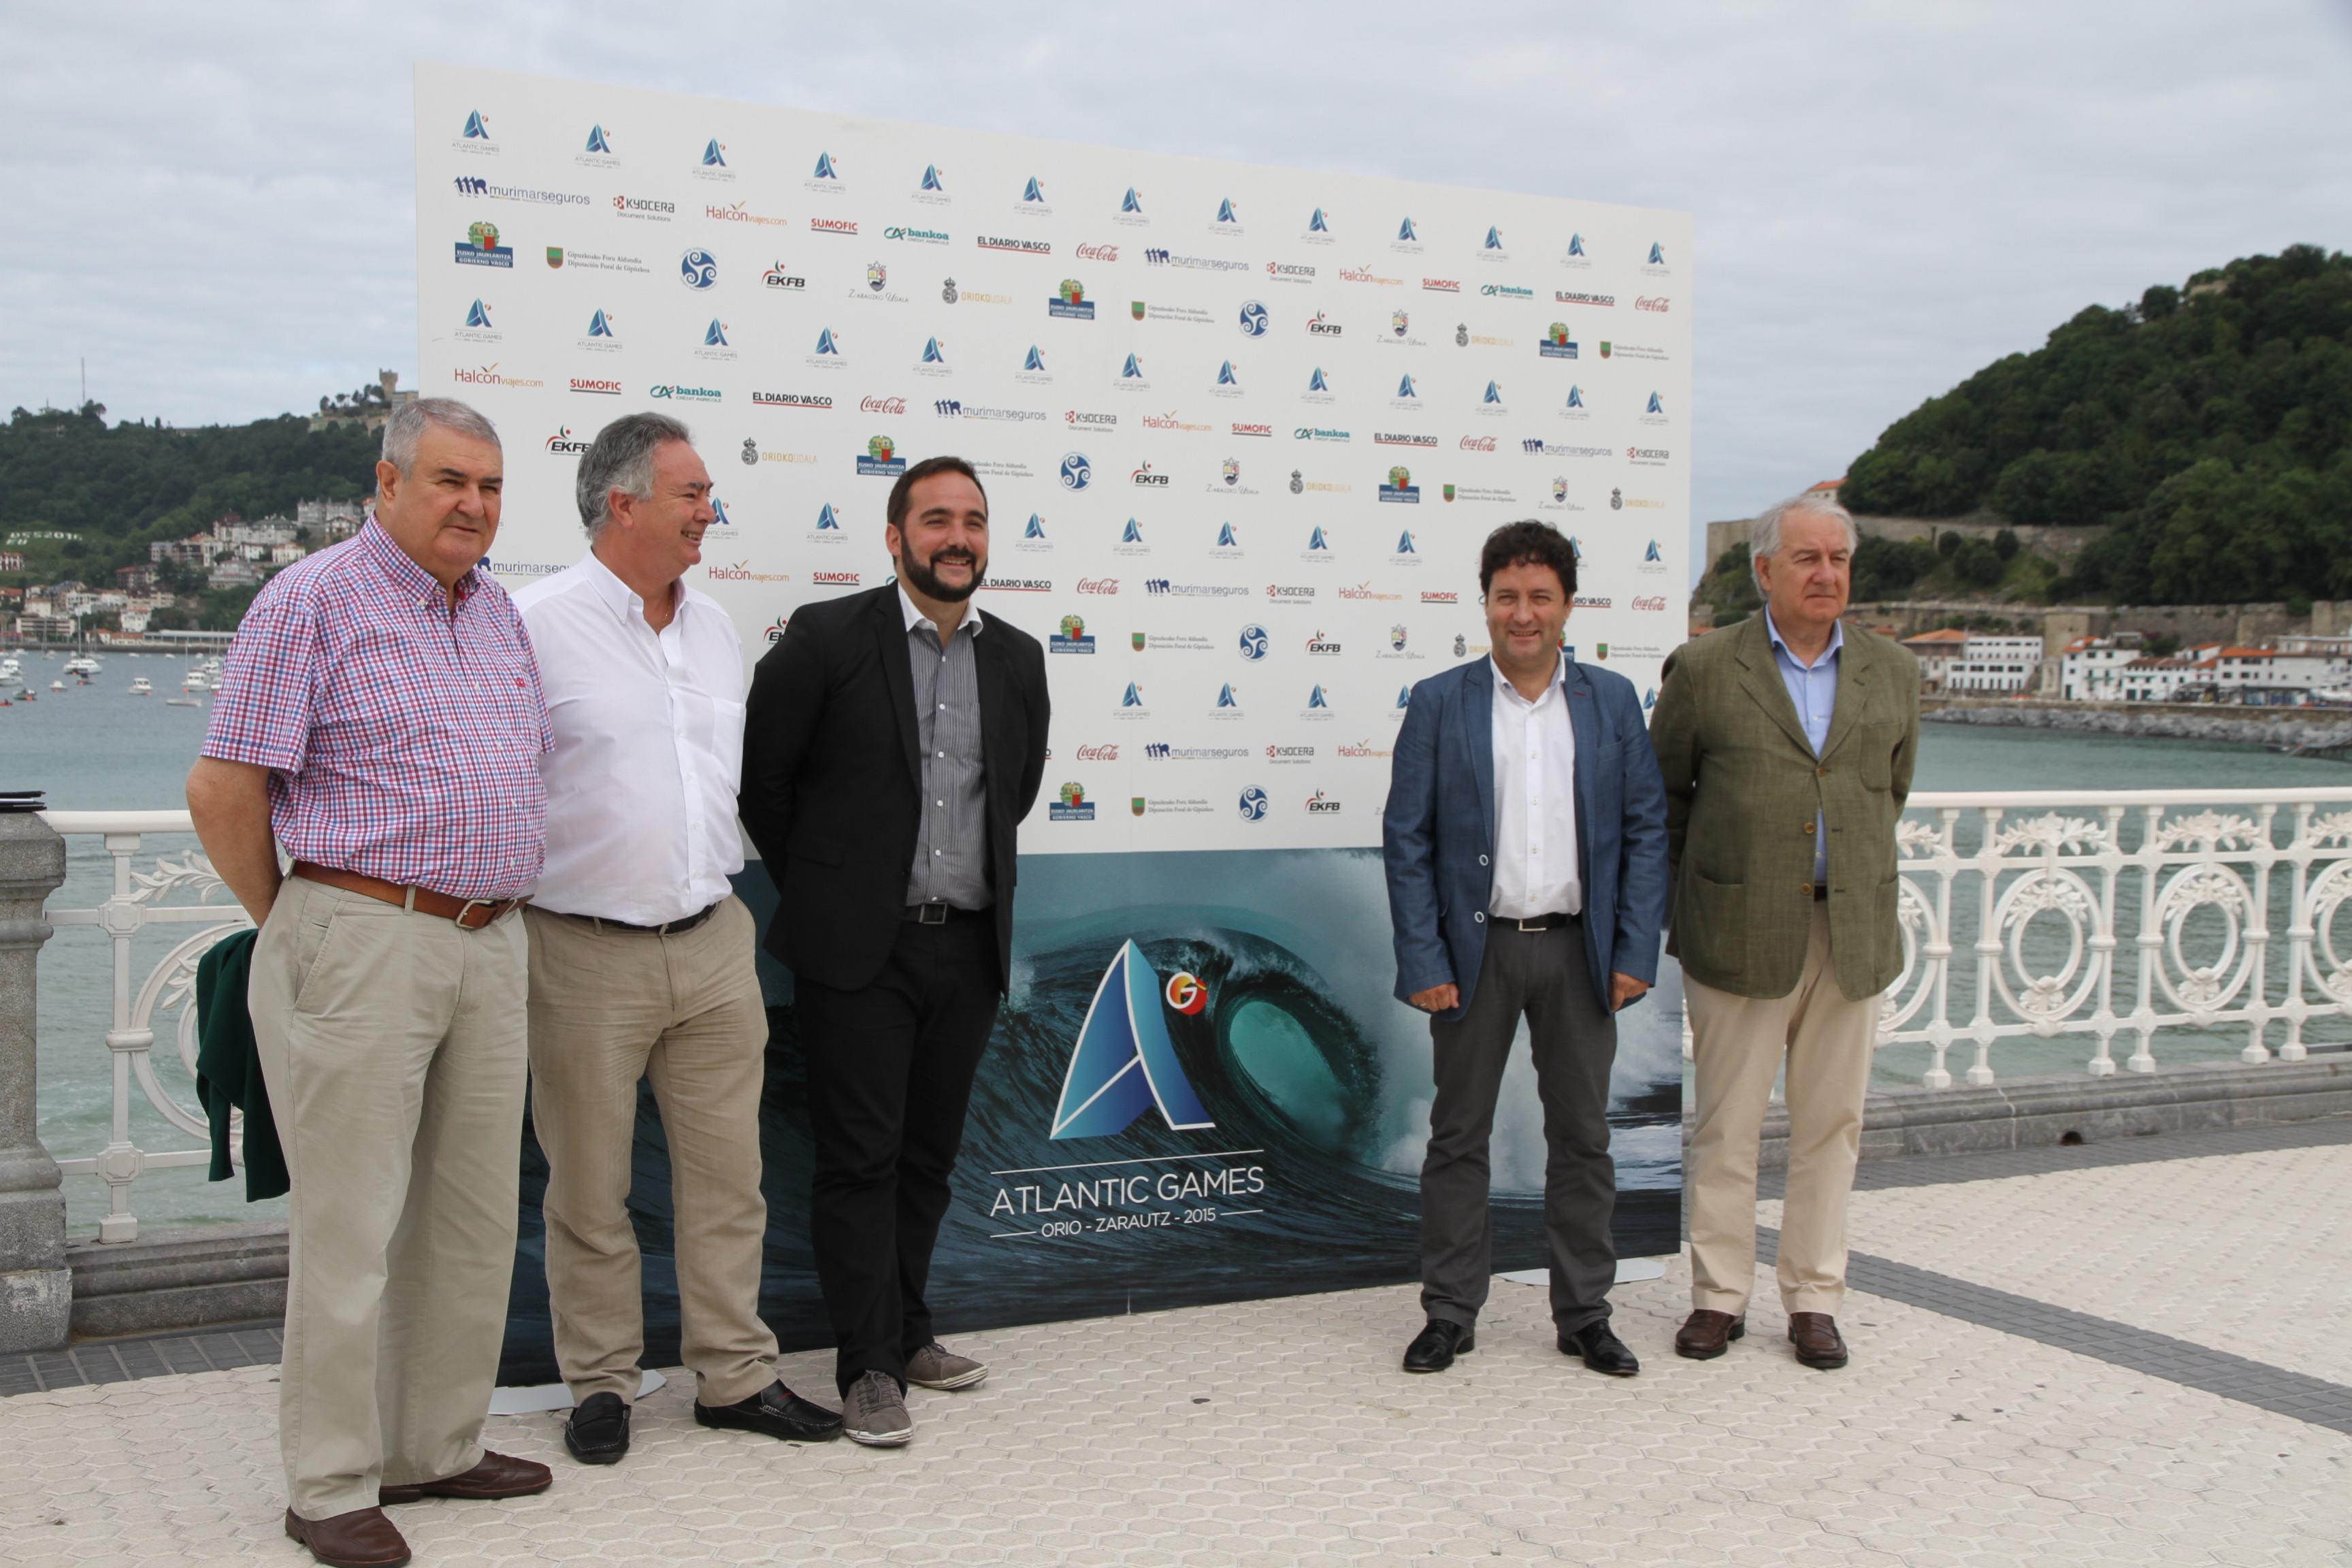 foto_rueda_de_prensa_presentacion_atlantic_games_1.JPG